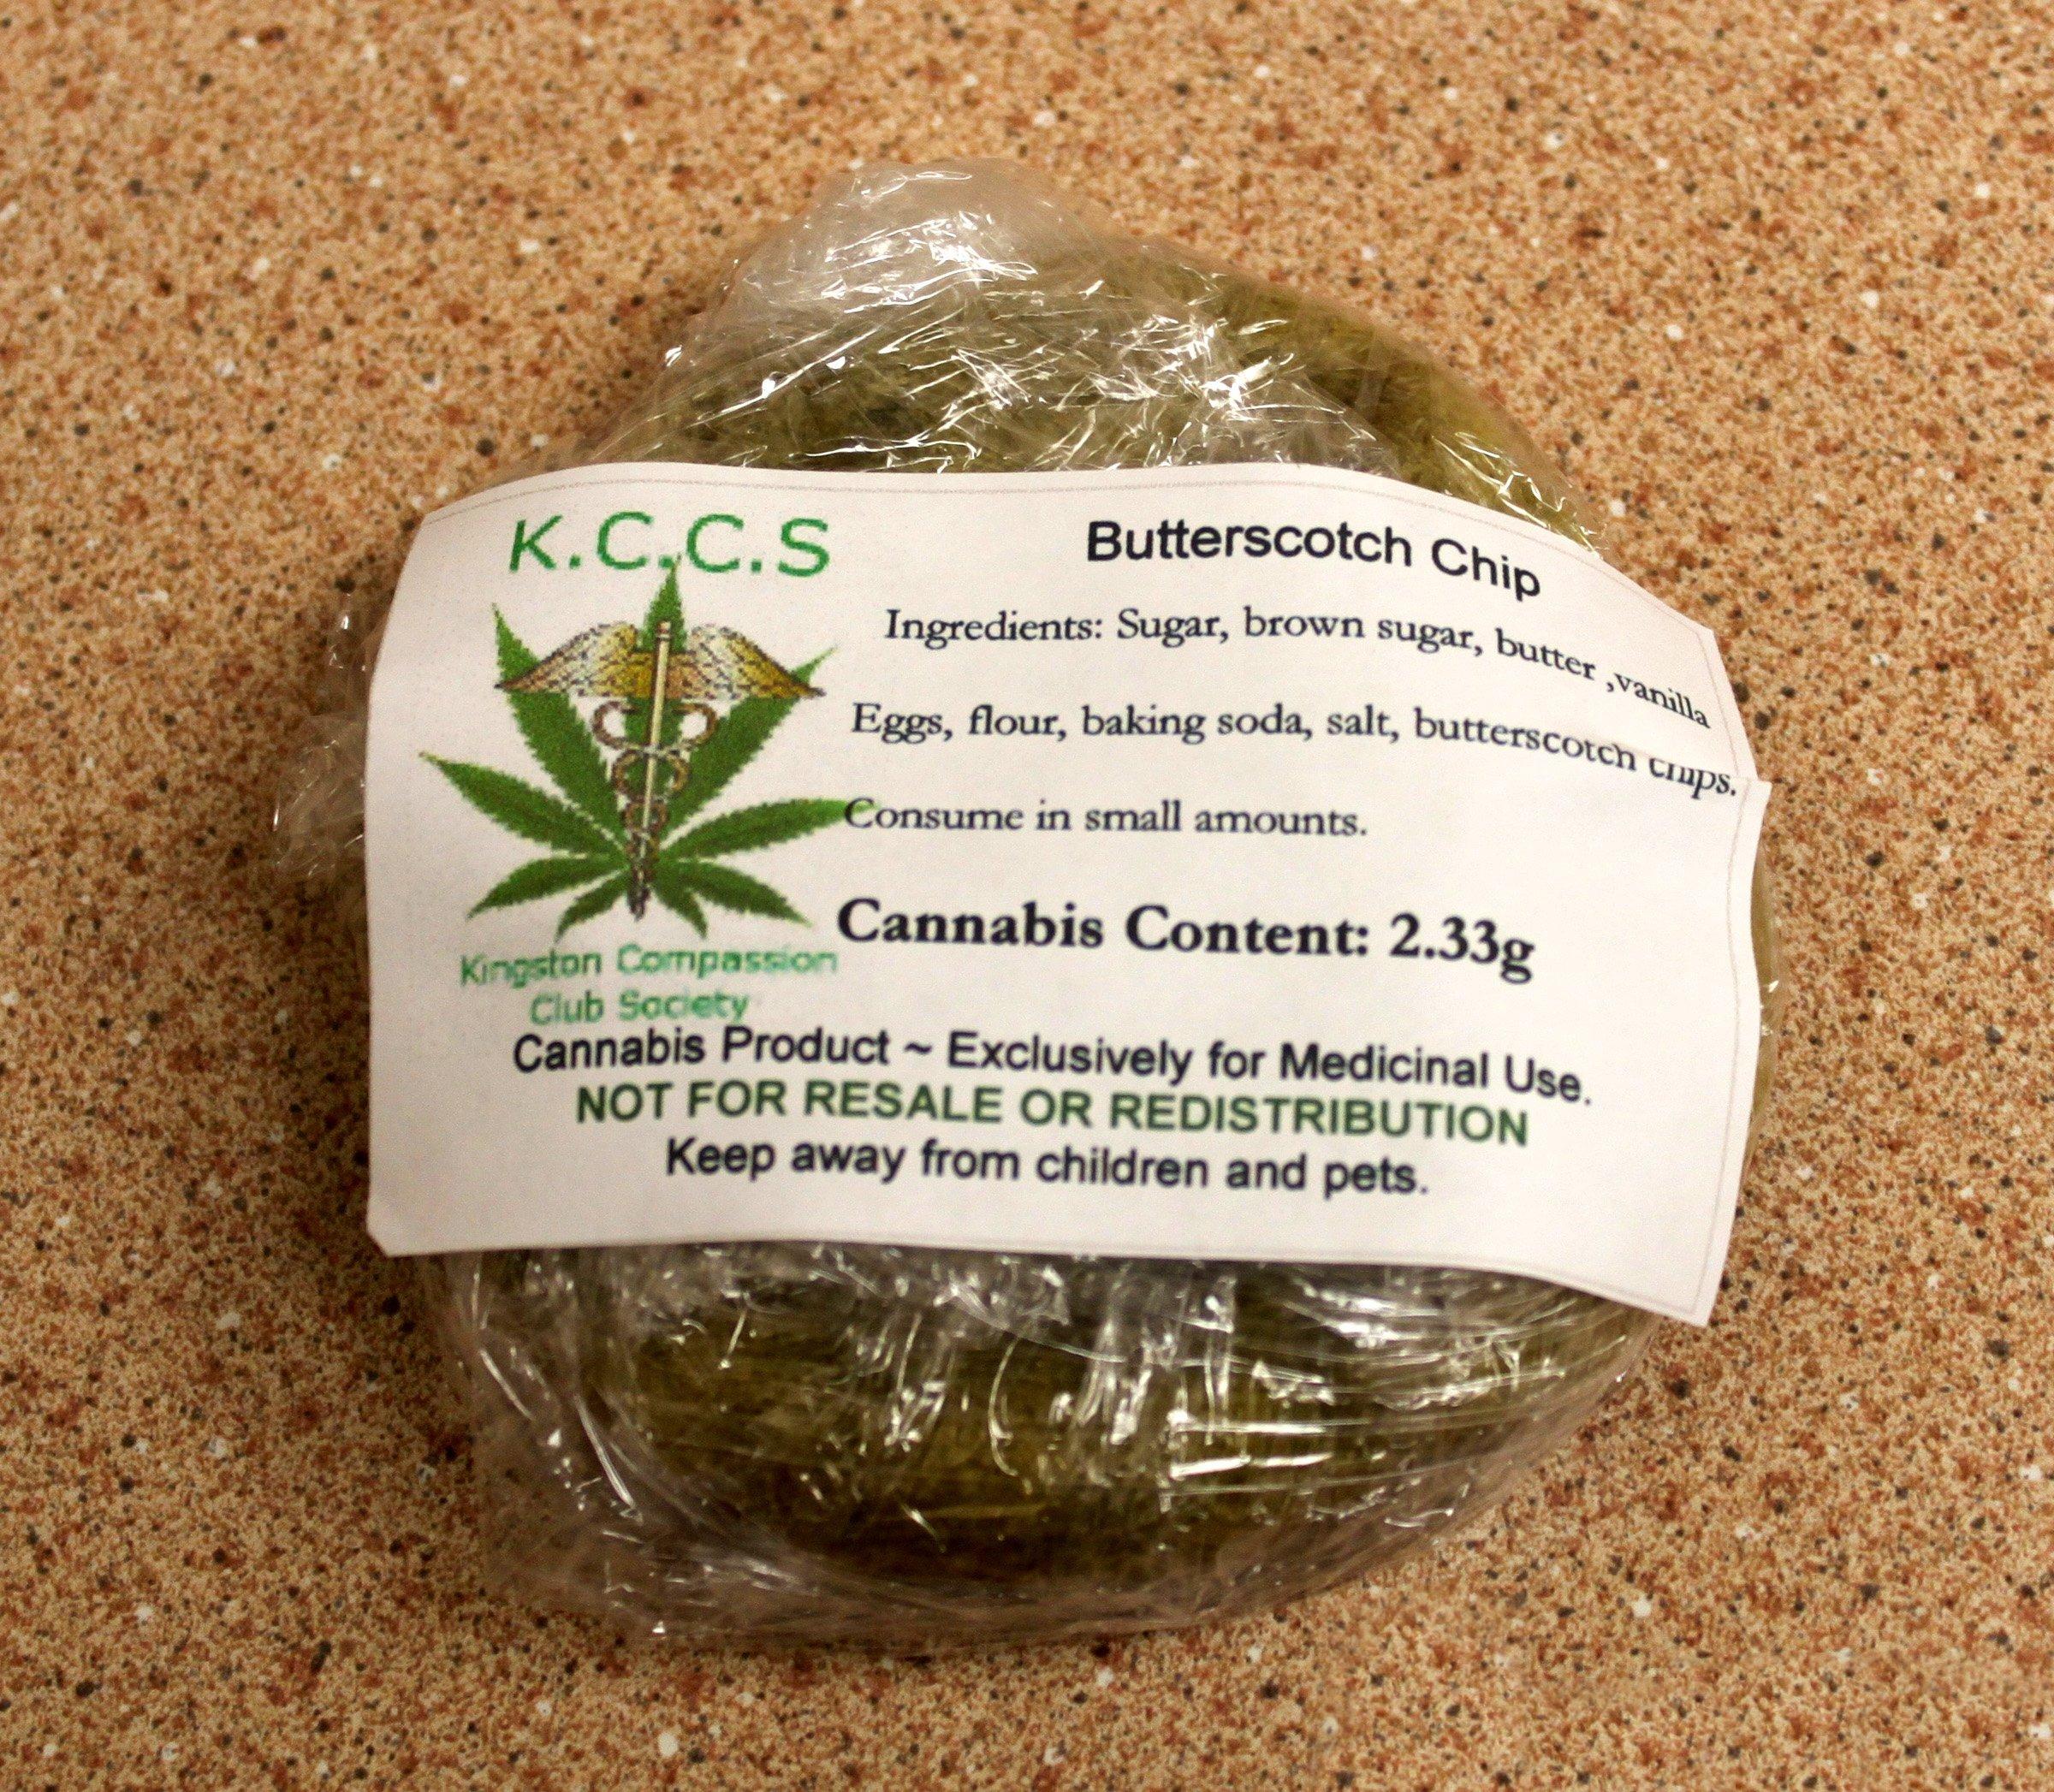 47894070 14919402467724595_origin have your weed and eat it too marijuana edibles stocks seeking alpha